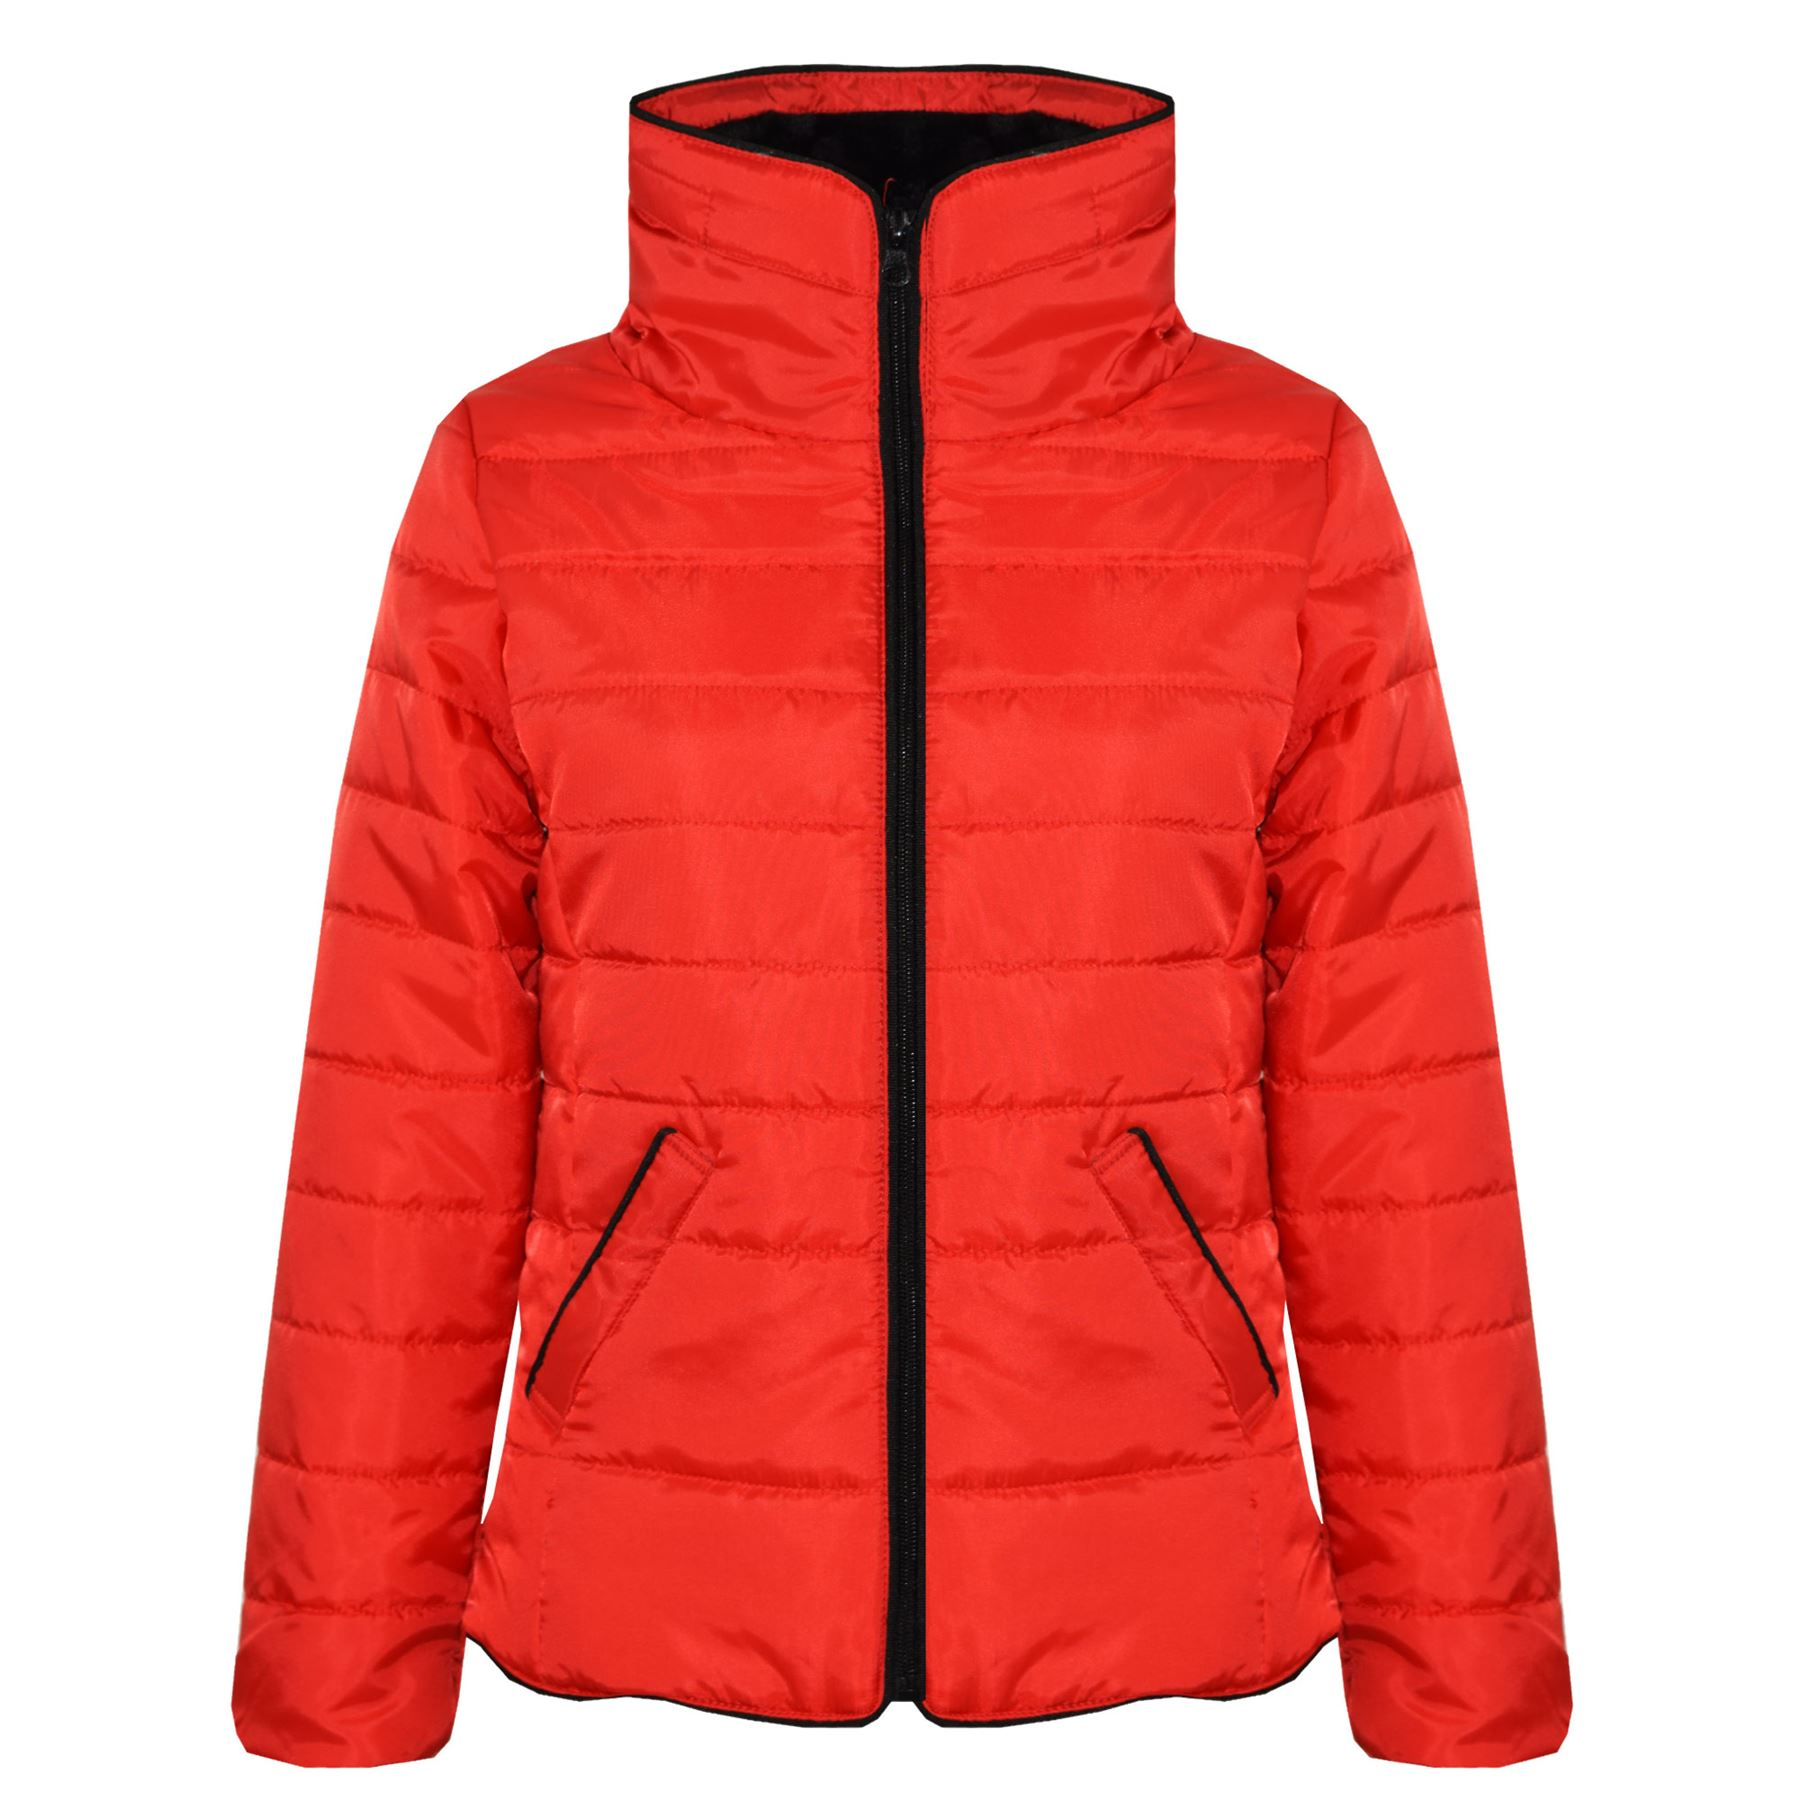 319fb6788888 Girls Jacket Kids Red Padded Puffer Bubble Faux Fur Collar Warm ...